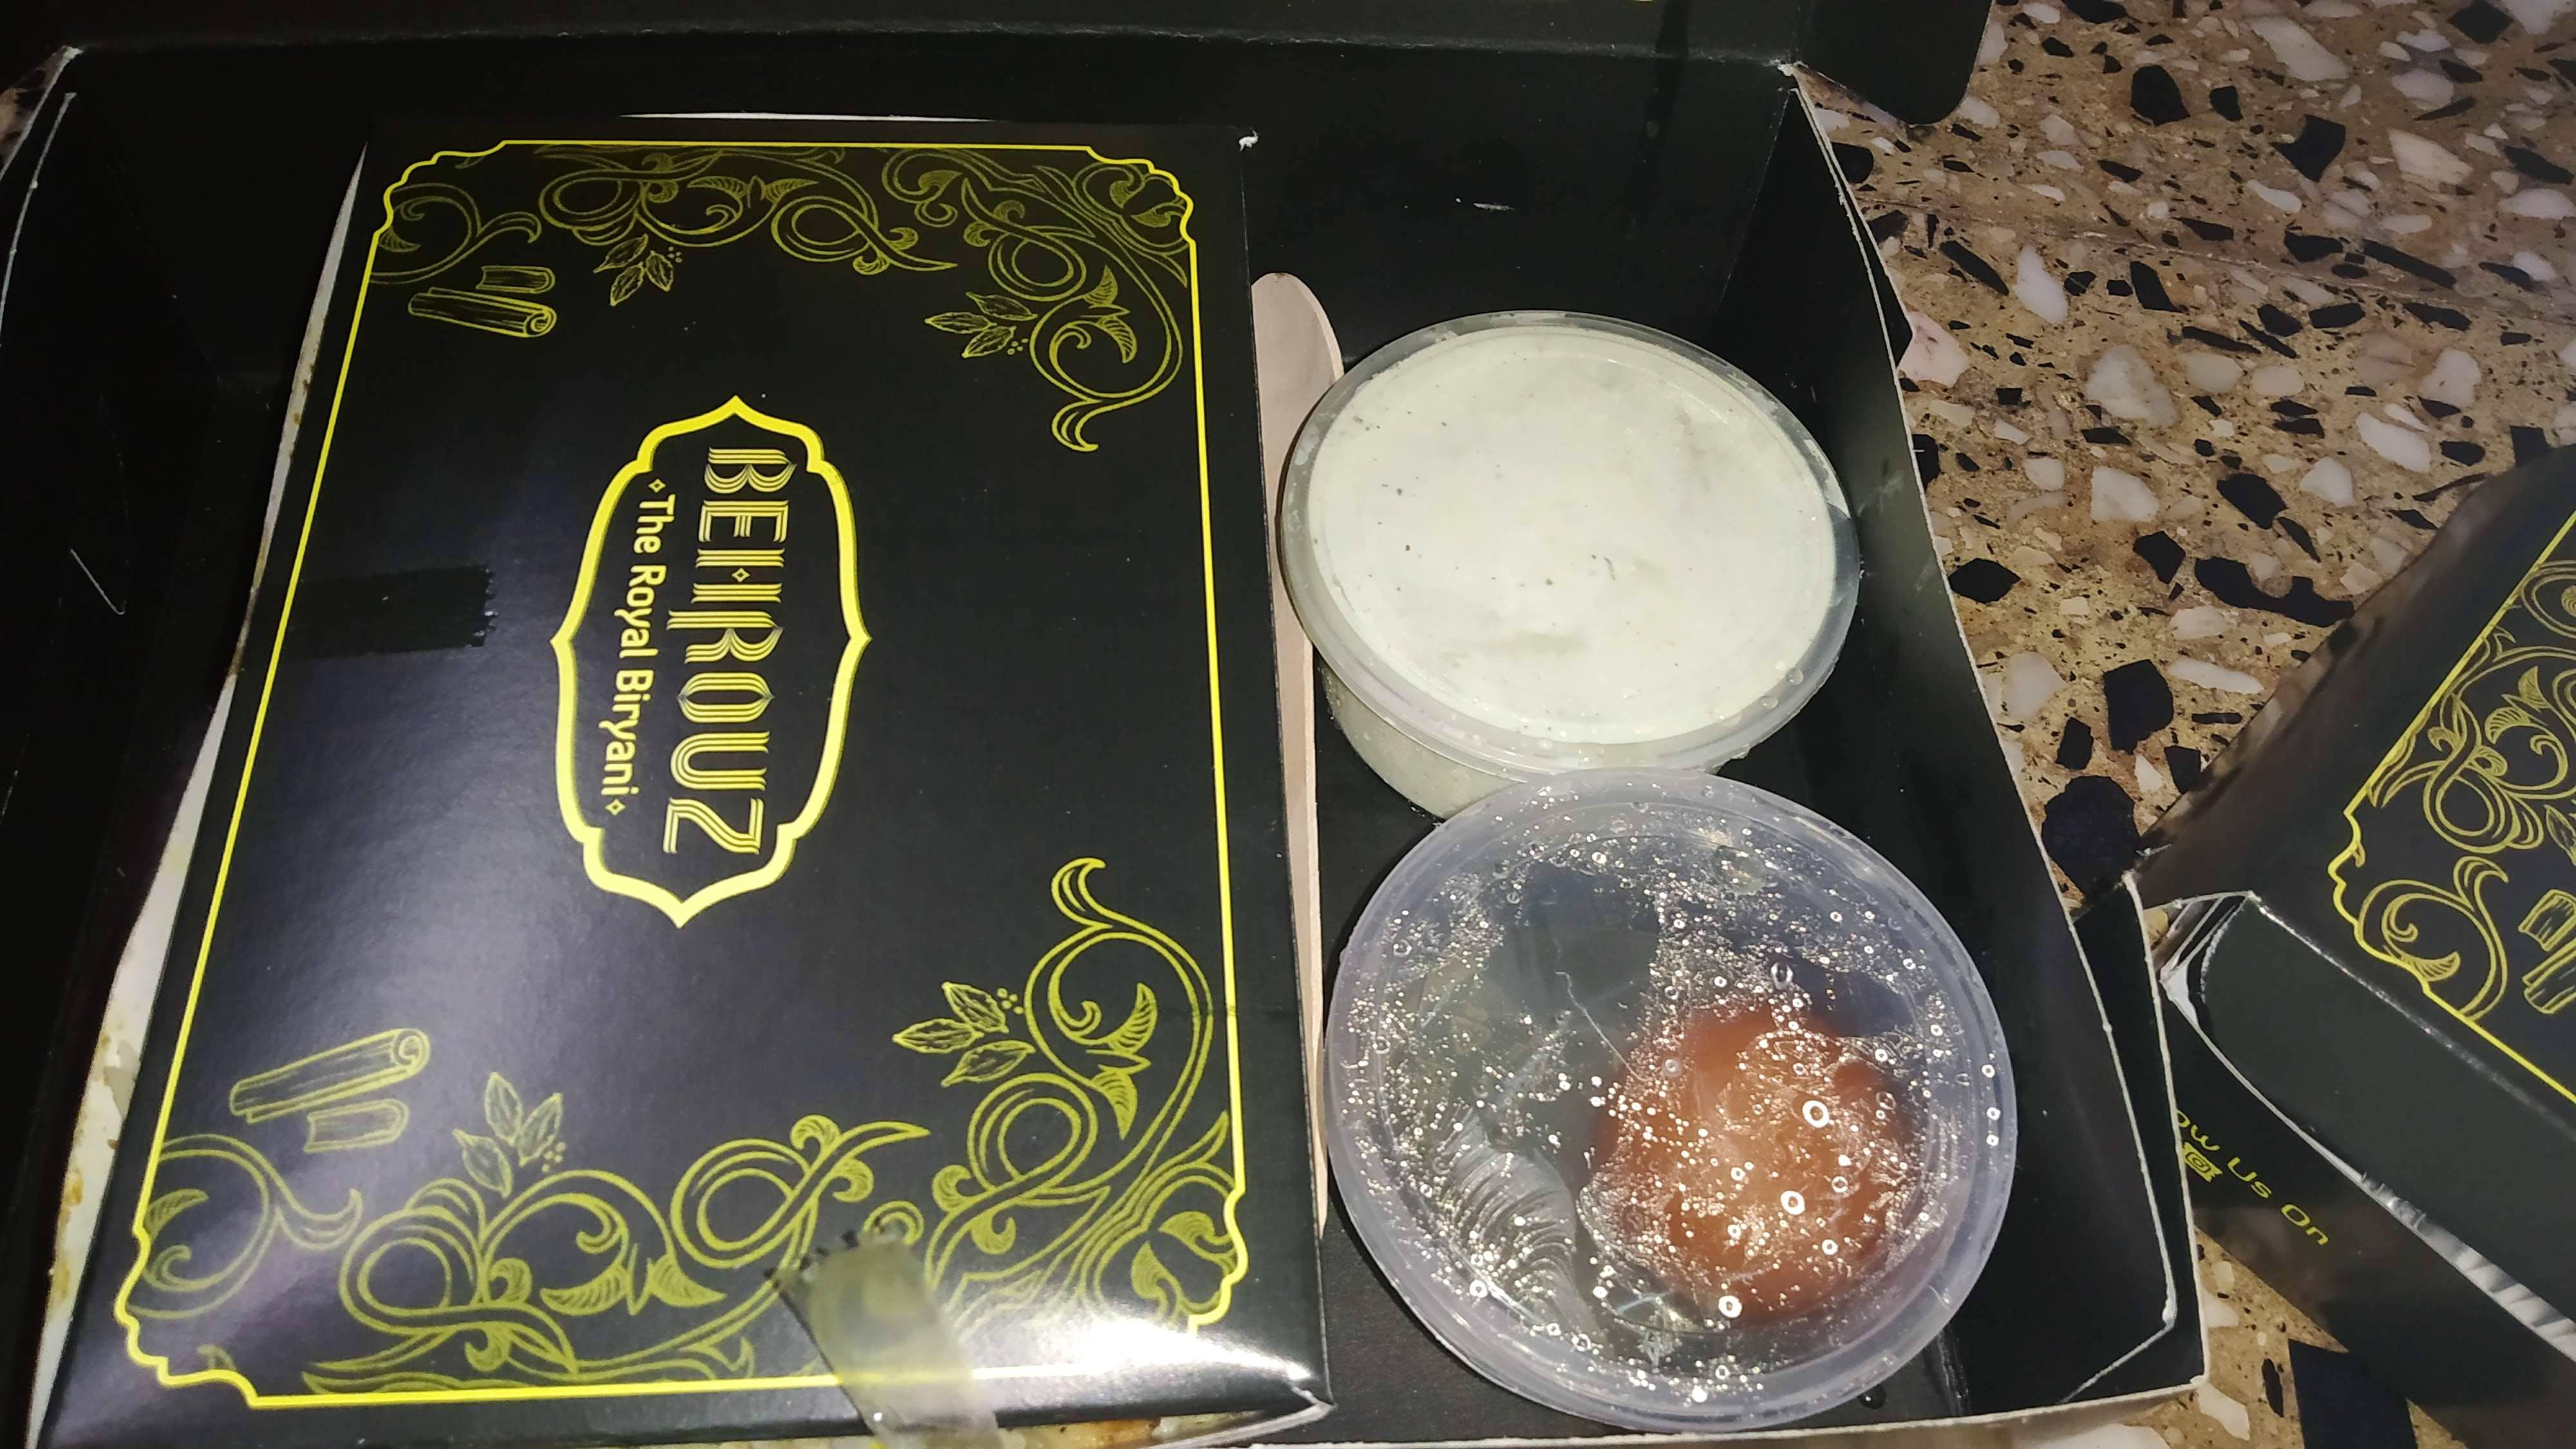 Biryani Craving? Order From Behrouz Biryani Asap!